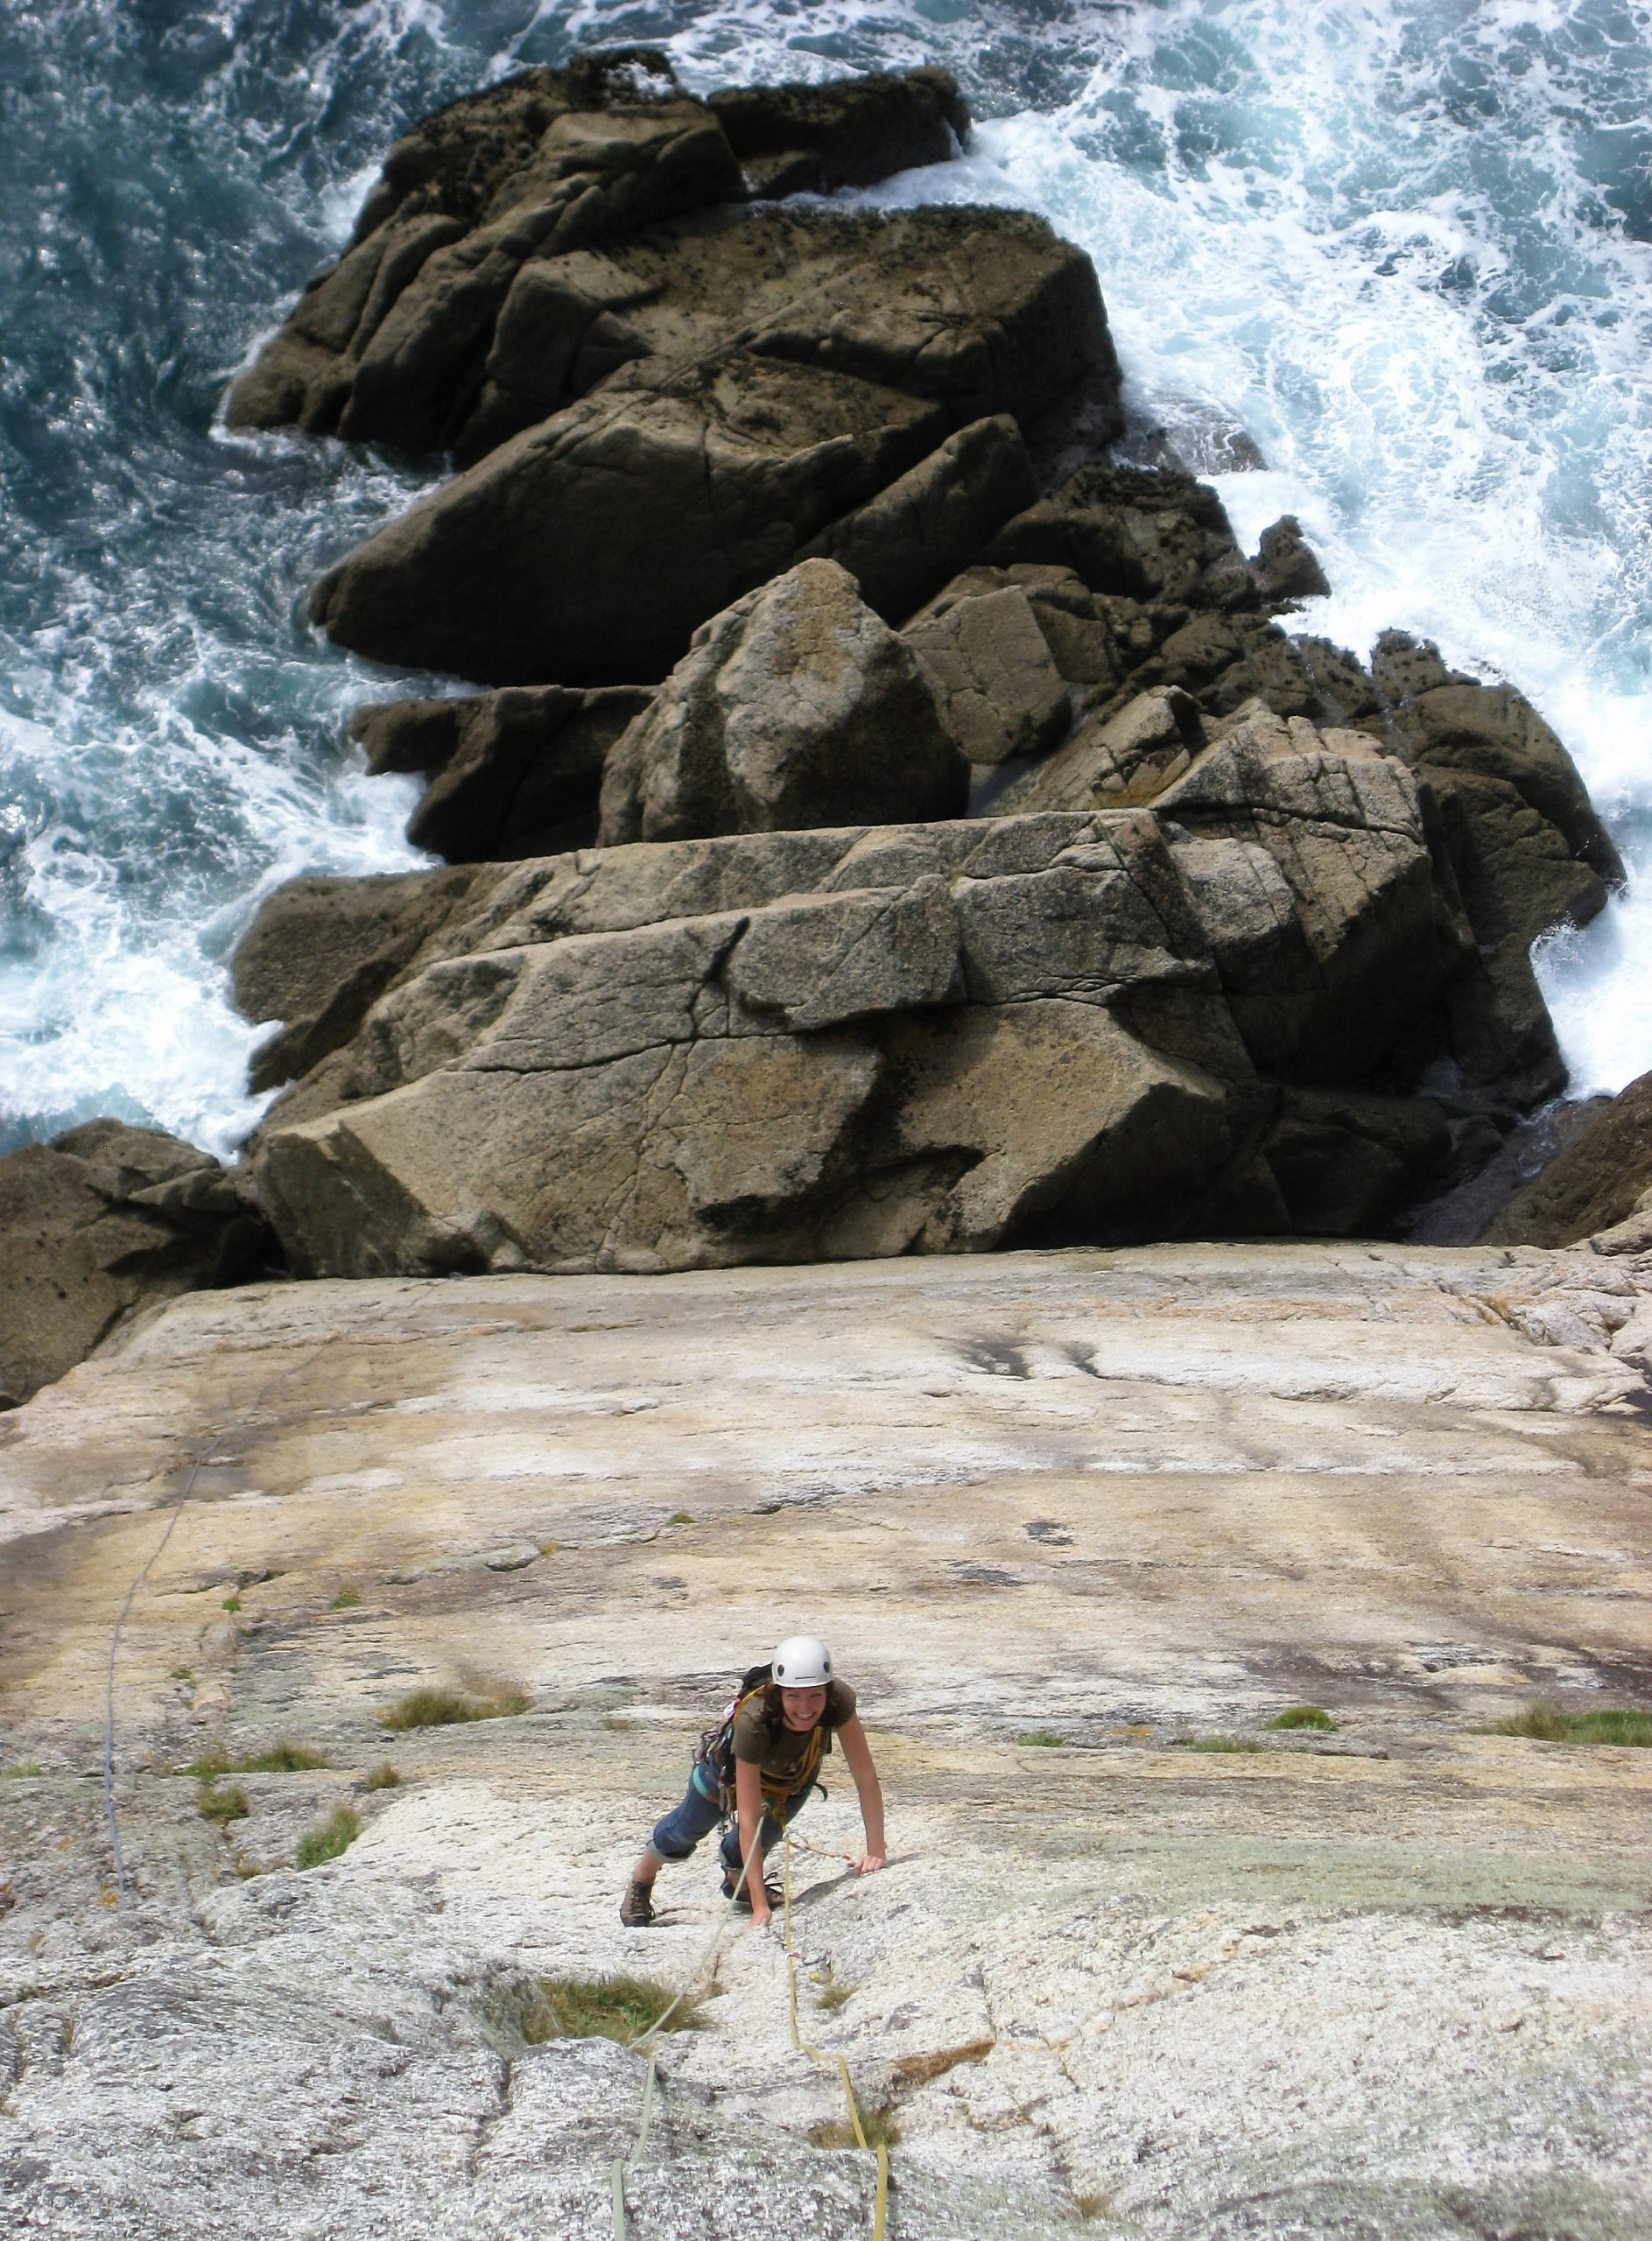 Rock climbing on Lundy Island